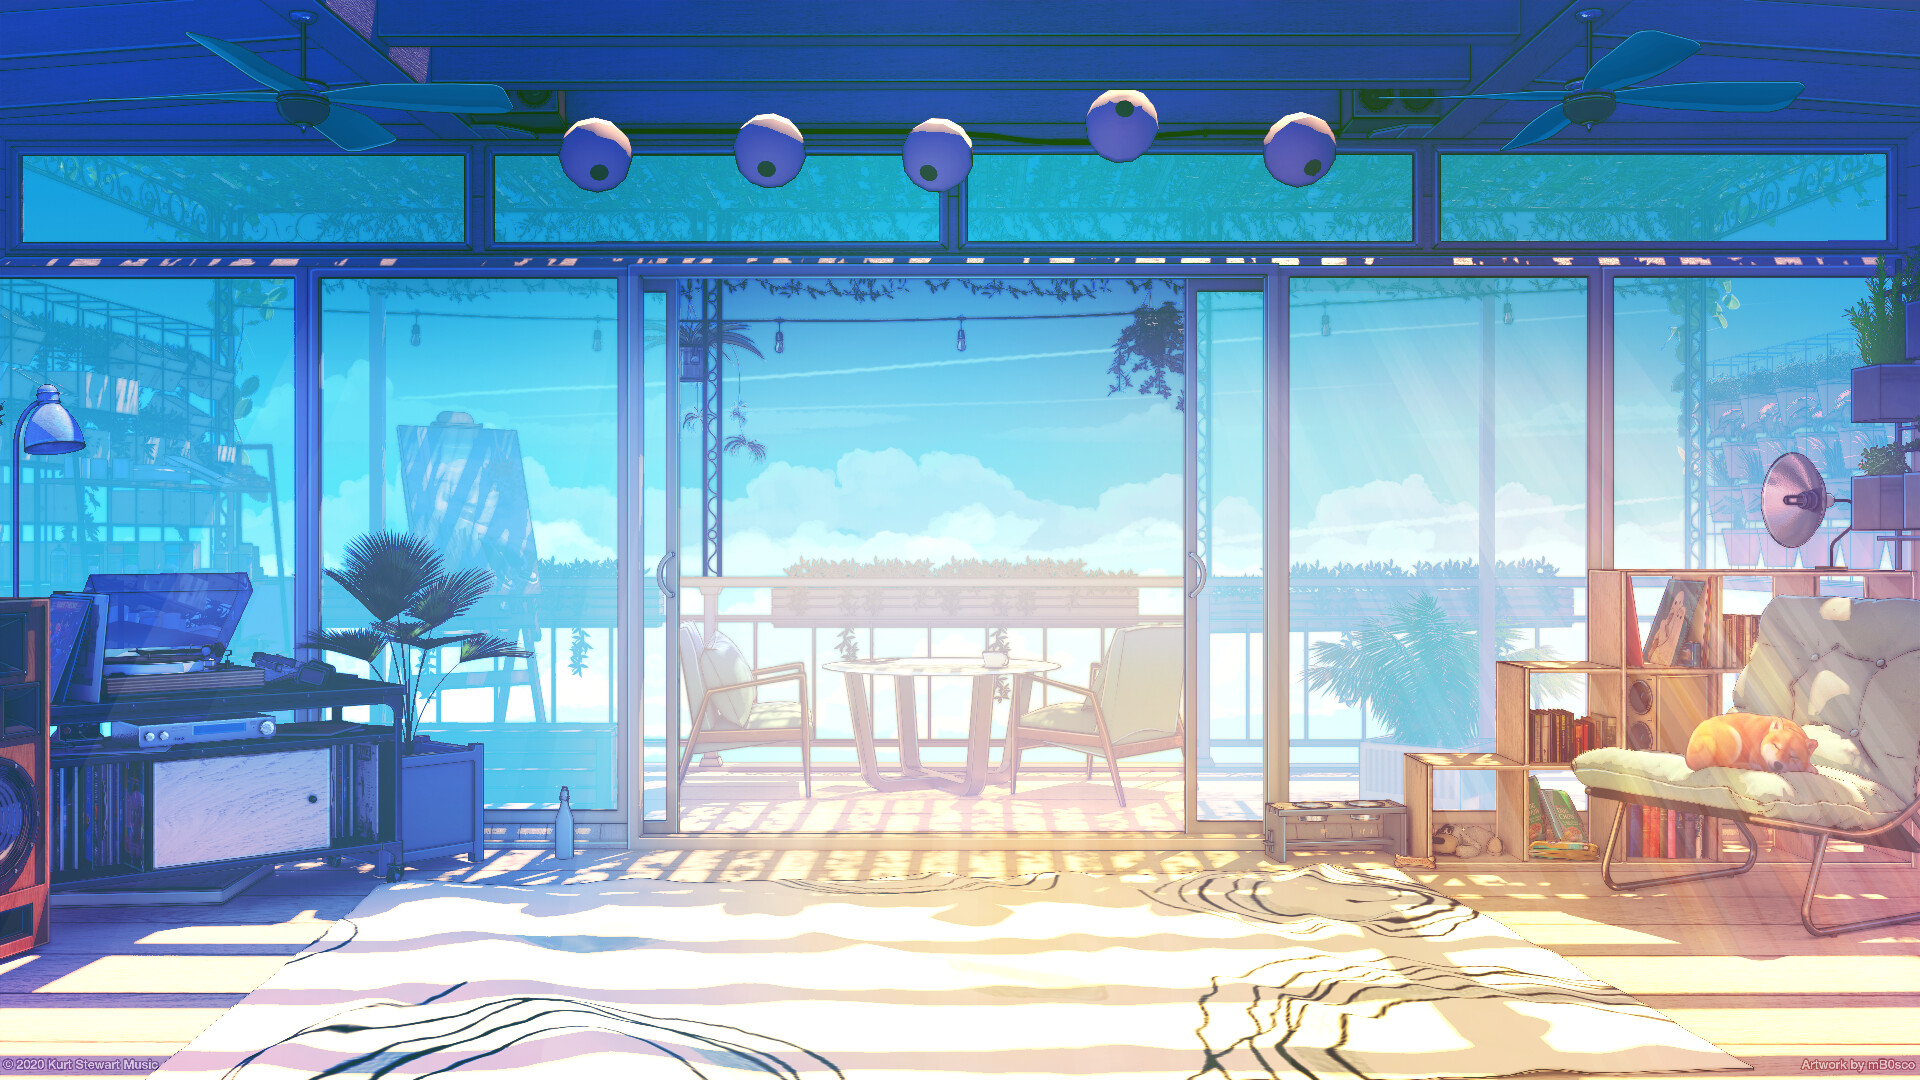 Digital Art Digital Bogdan MB0sco Sunlight Dog Shiba Inu Shiba Record Players Balcony 1920x1080